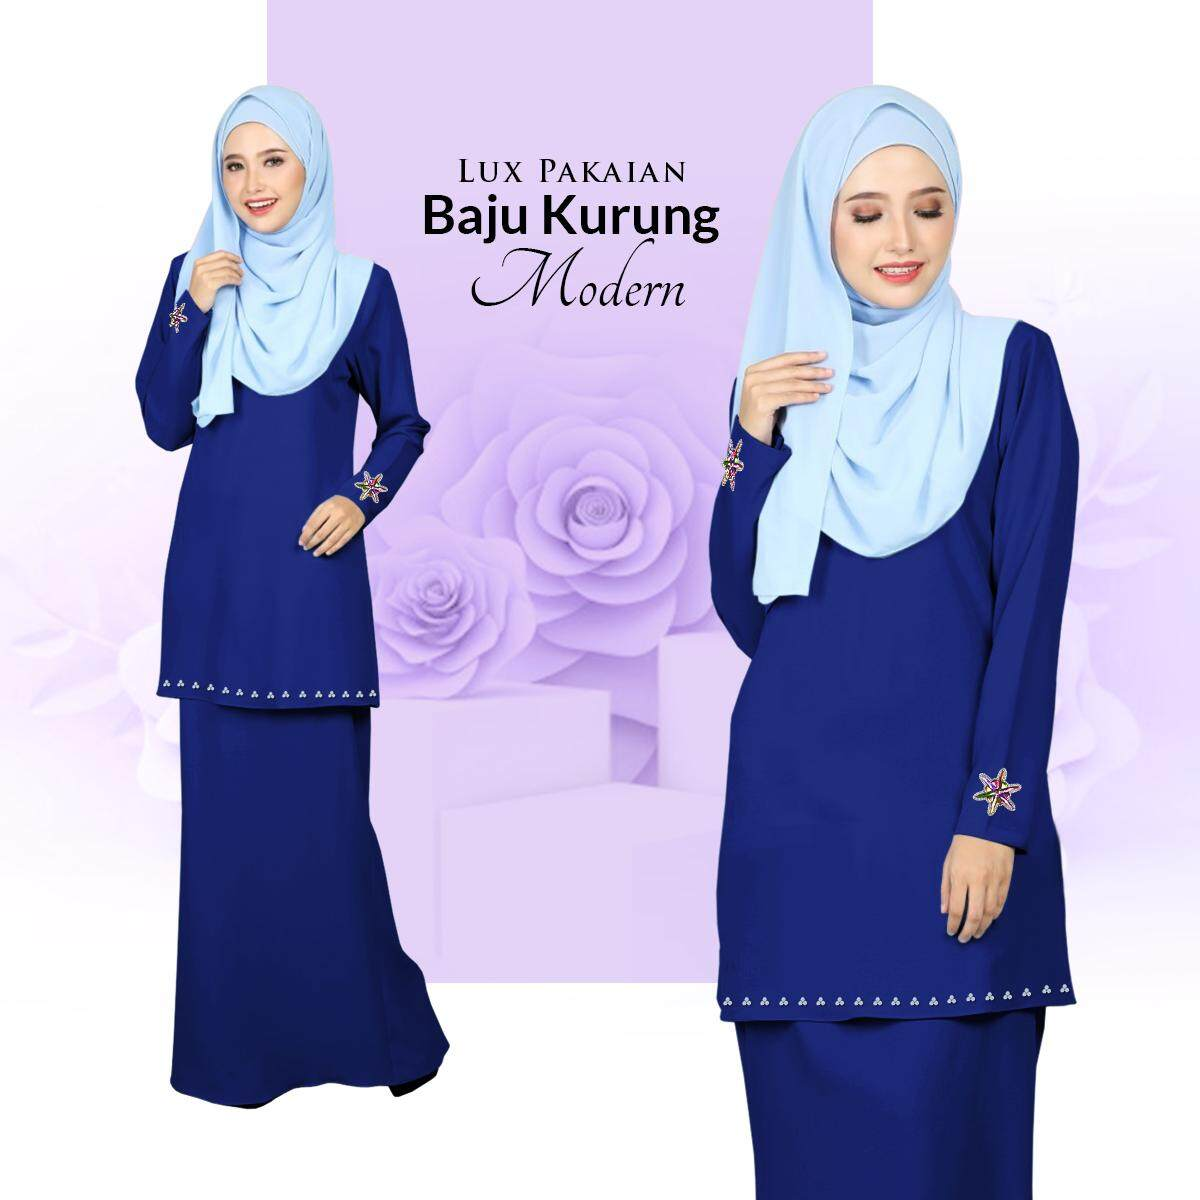 Harga Lux Pakaian Baju Kurung Modern with Stylish Bunch & Batu Terkini